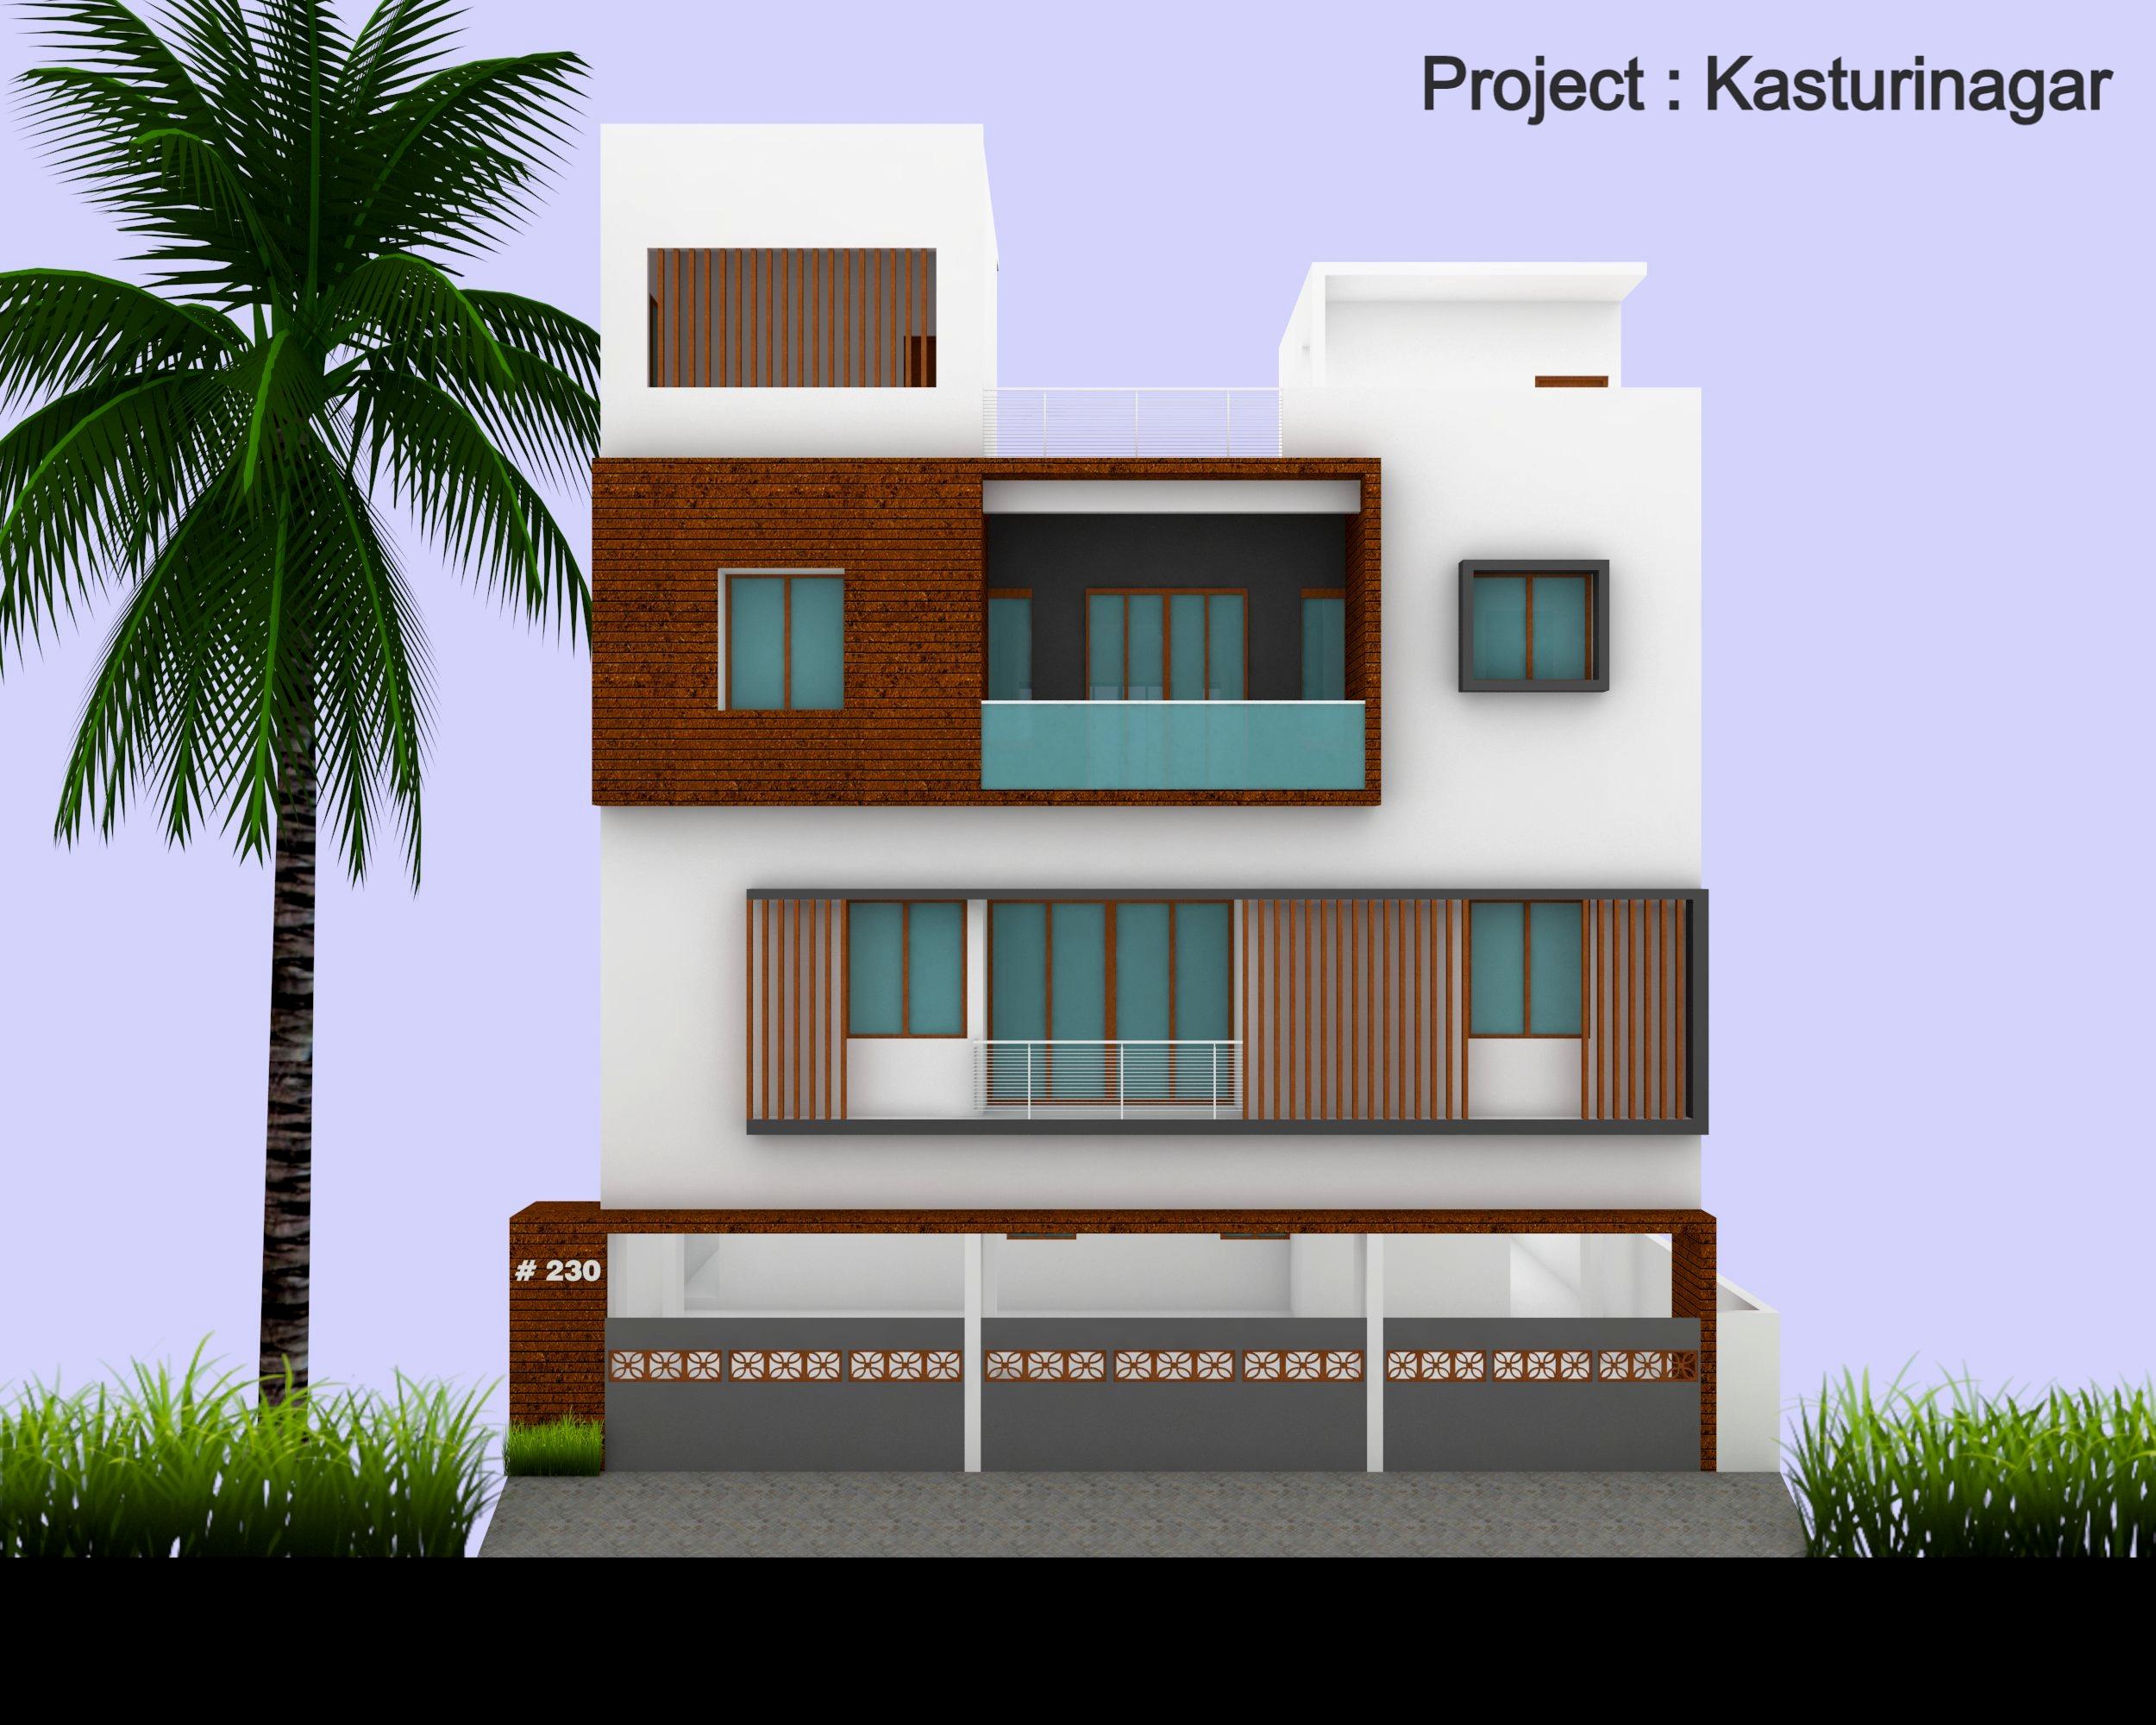 Kasturinagar1_Bangalore_edited